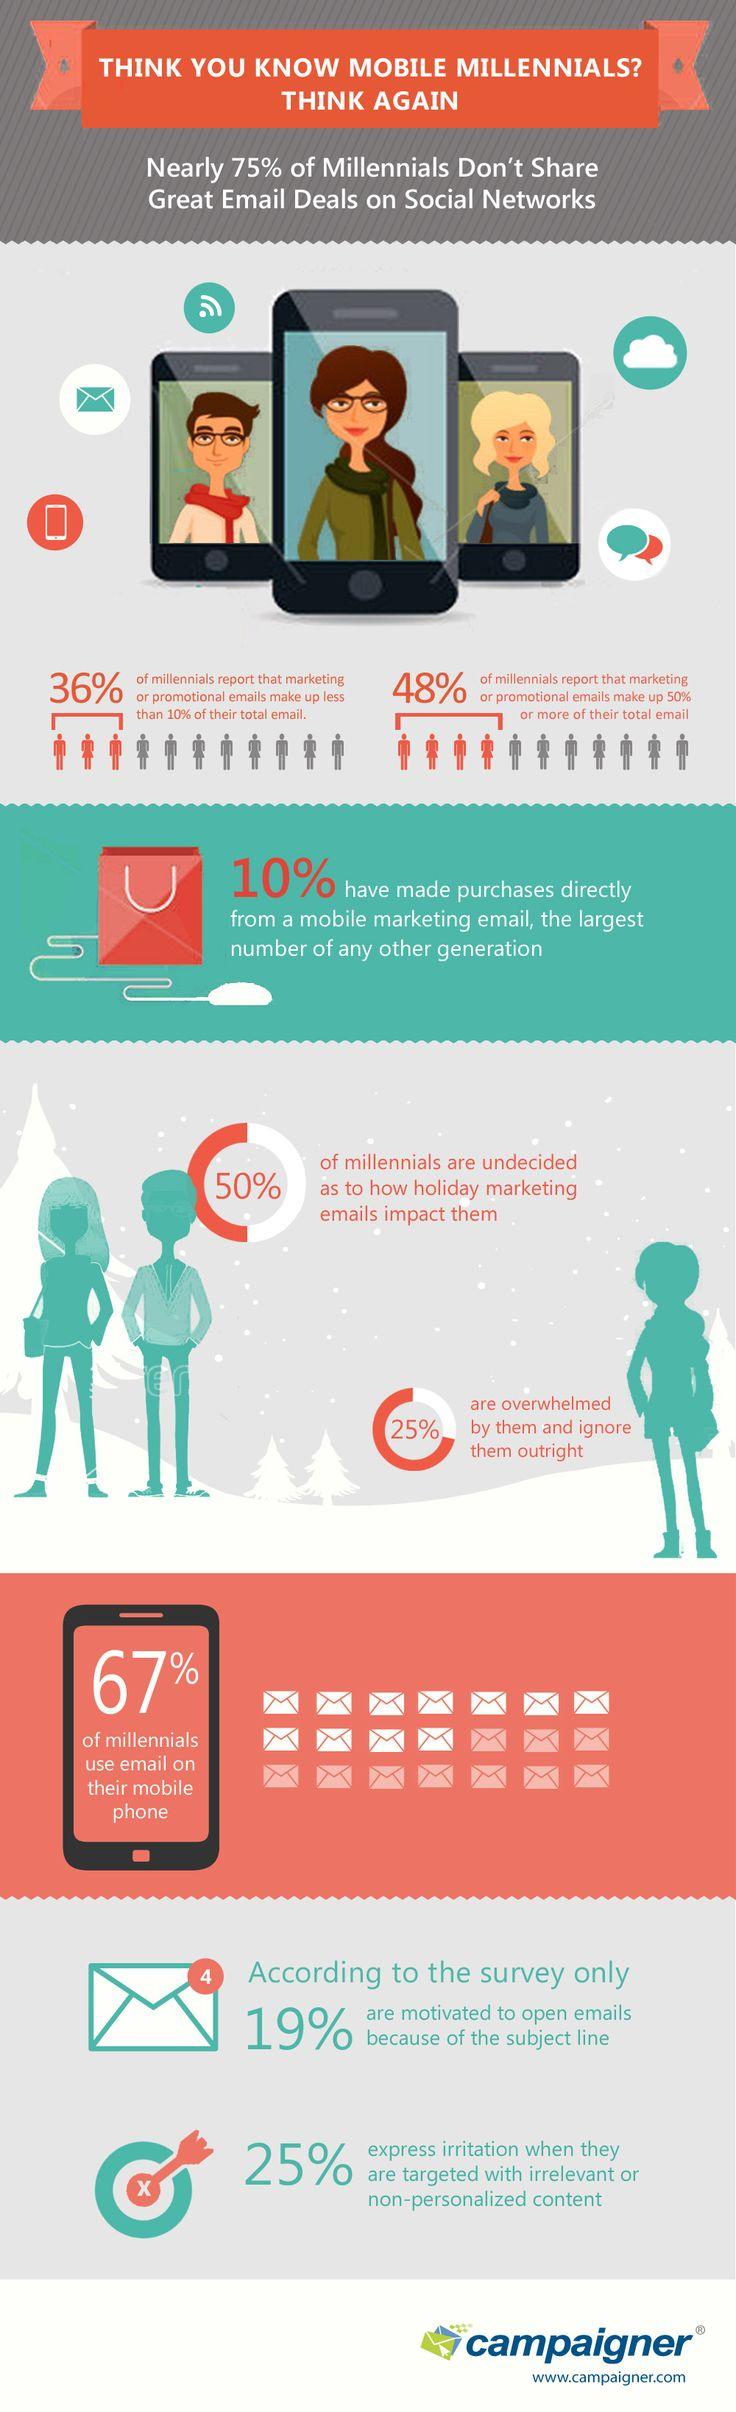 Millennials and mobile #infographic  #mobile #millennials